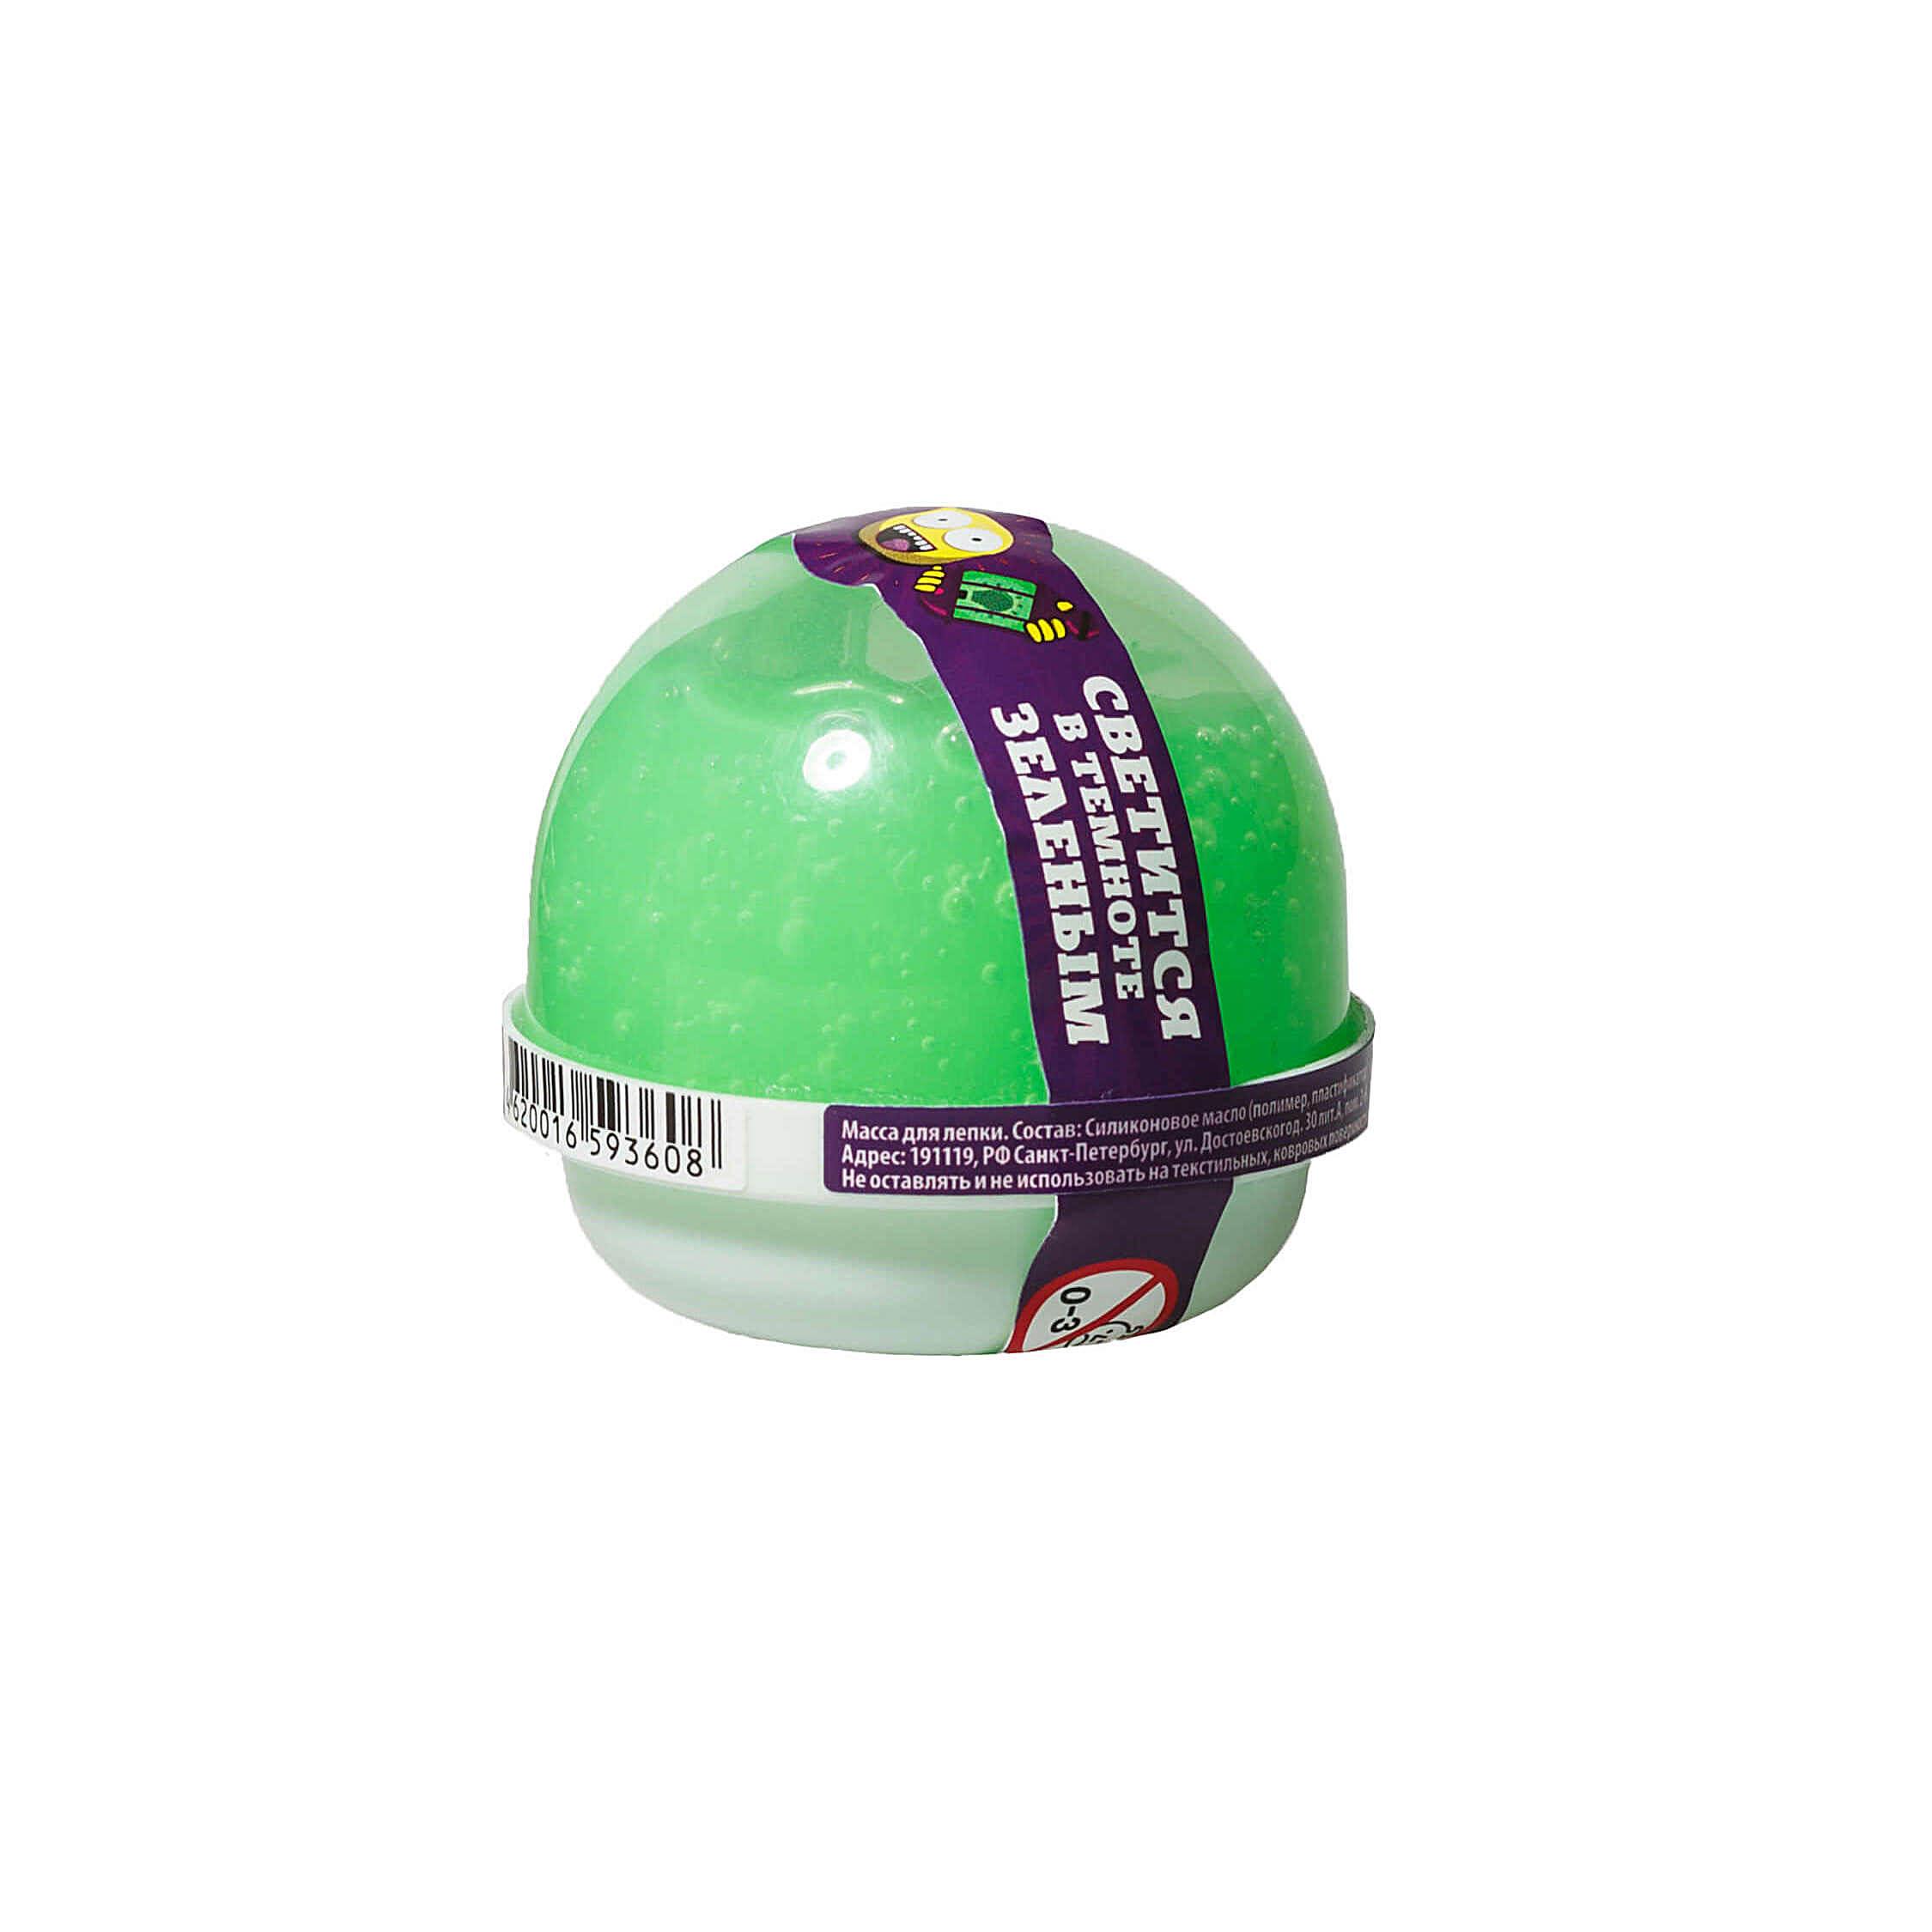 "NGGG25 ""Жвачка для рук ""Nano gum"", светится зеленым"", 25 гр."